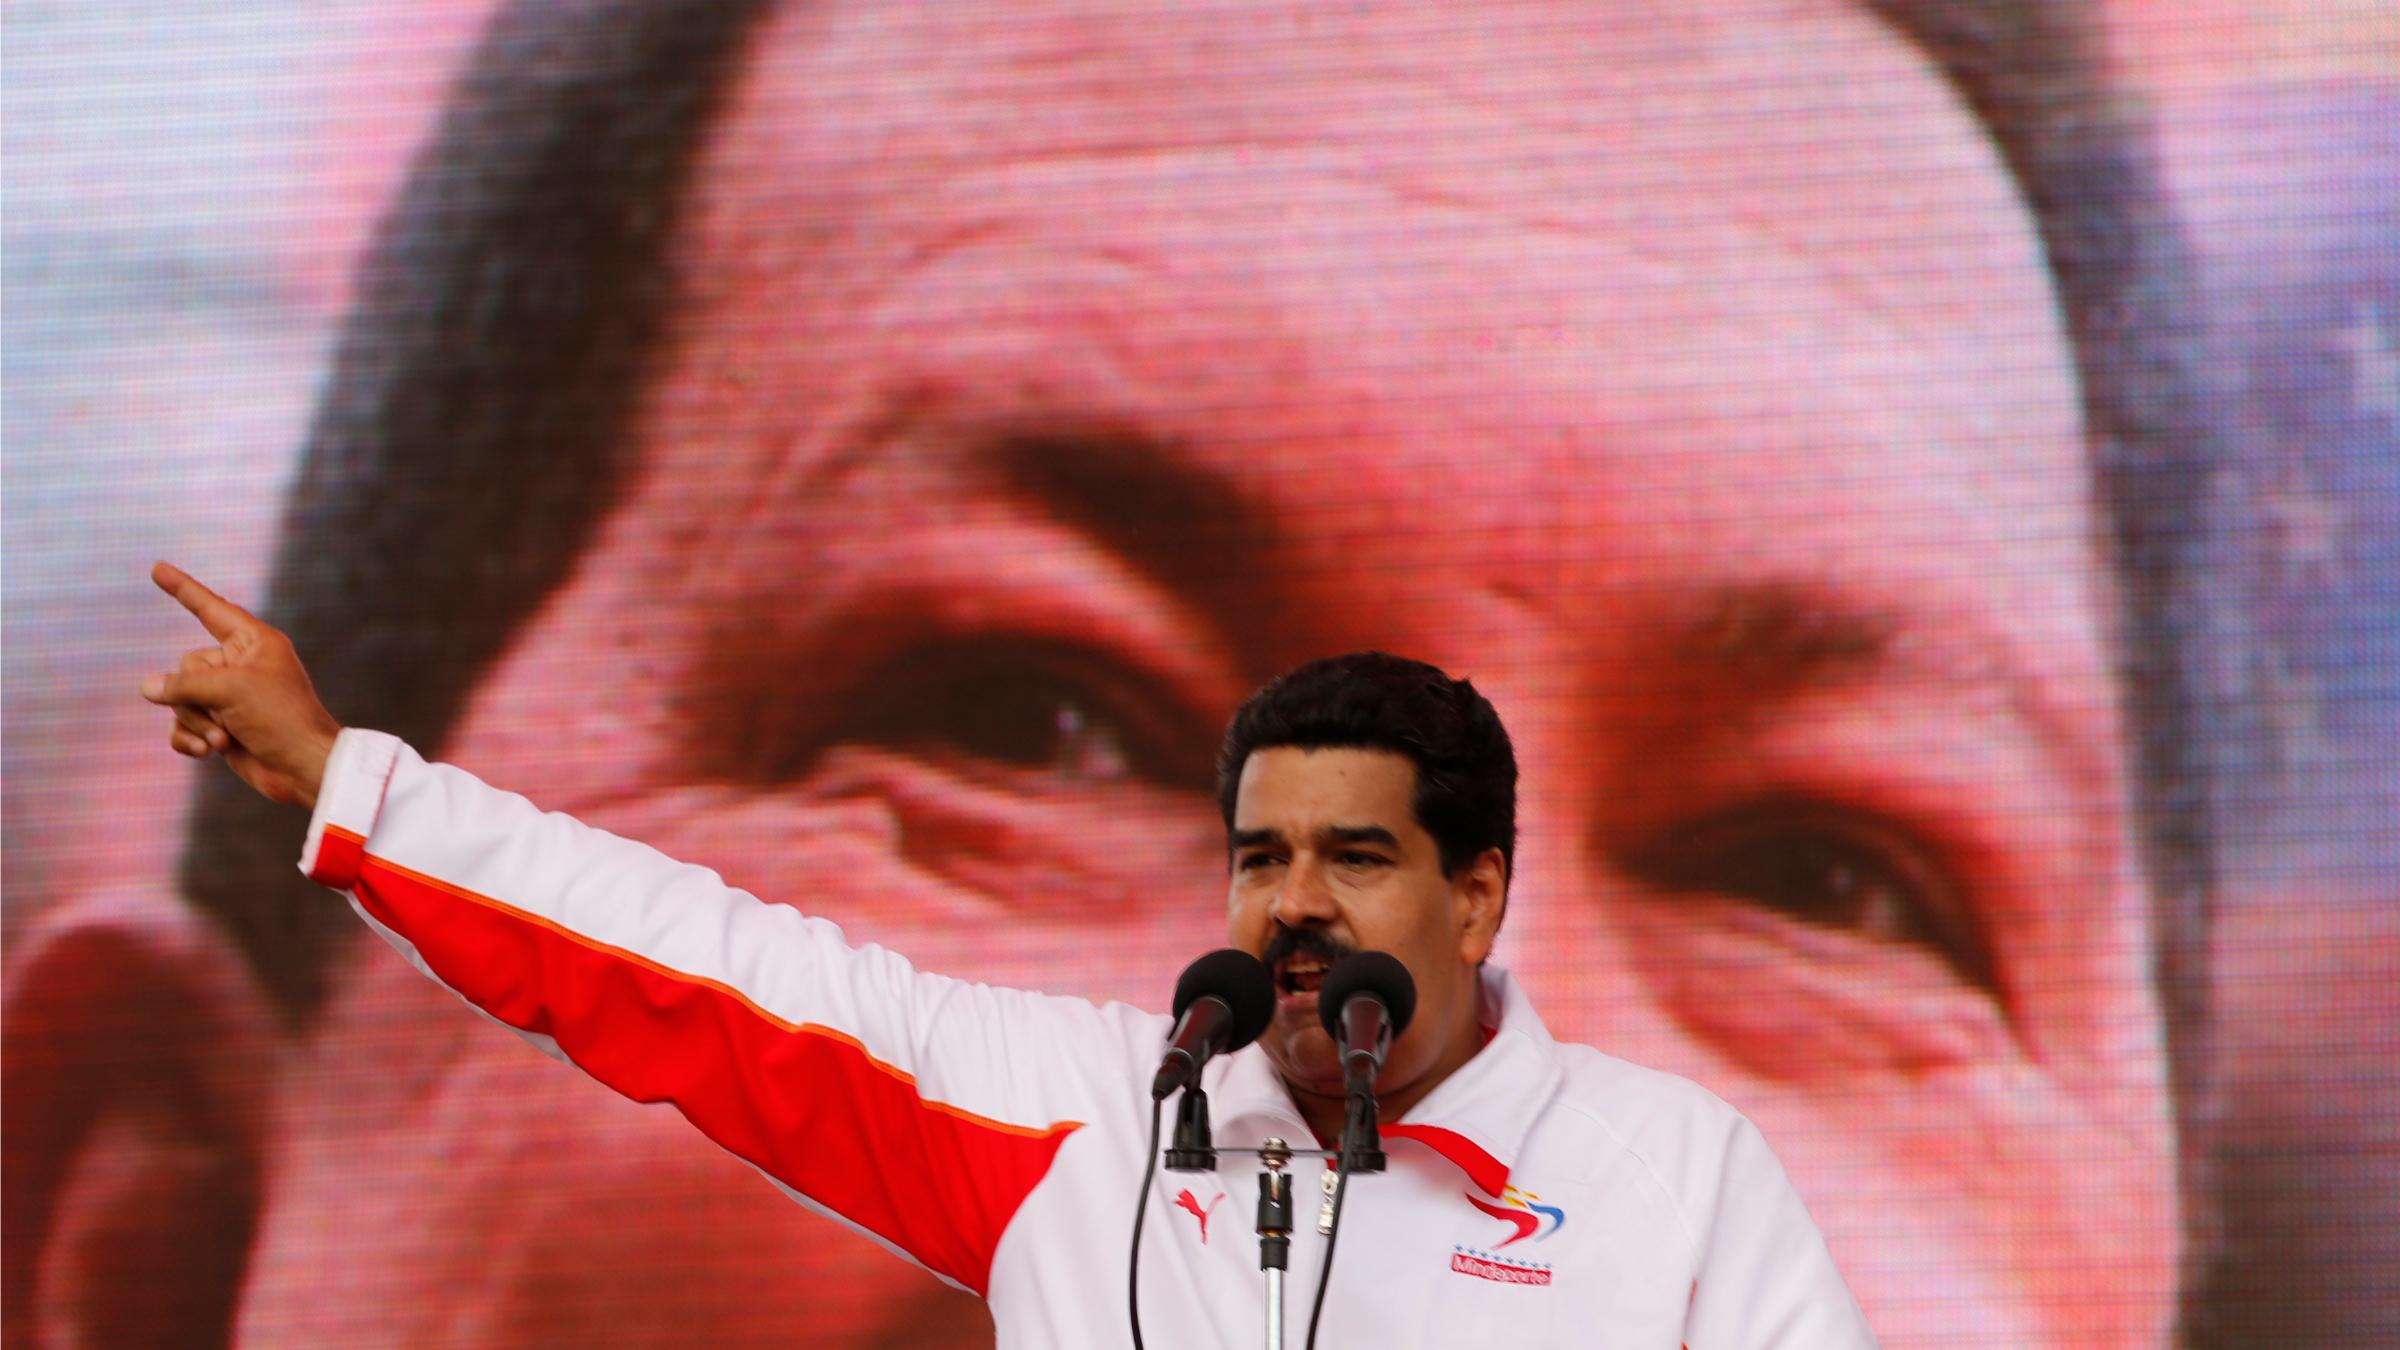 Hugo Chavez Nicolas Maduro